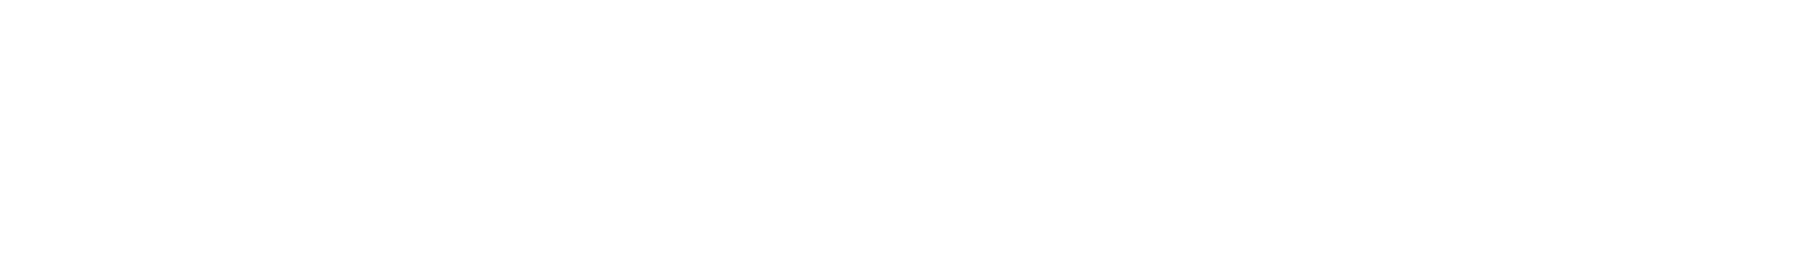 g abs05 028